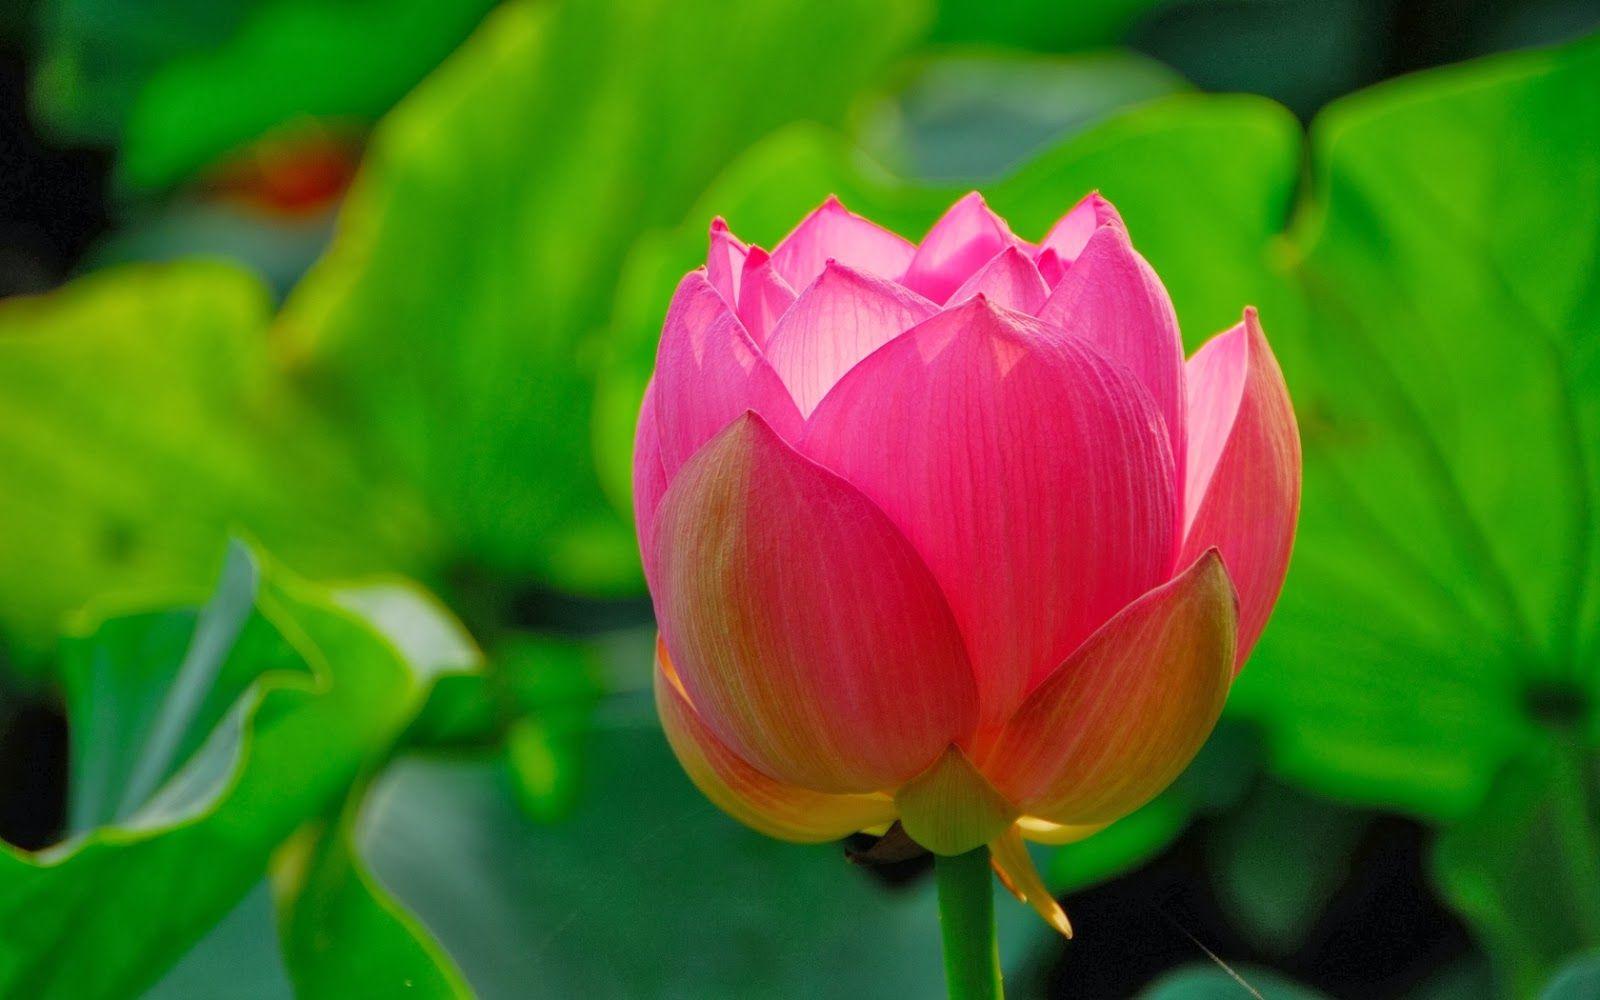 Fotos De Flores Bonitas Gratis Para Fondo De Pantalla En